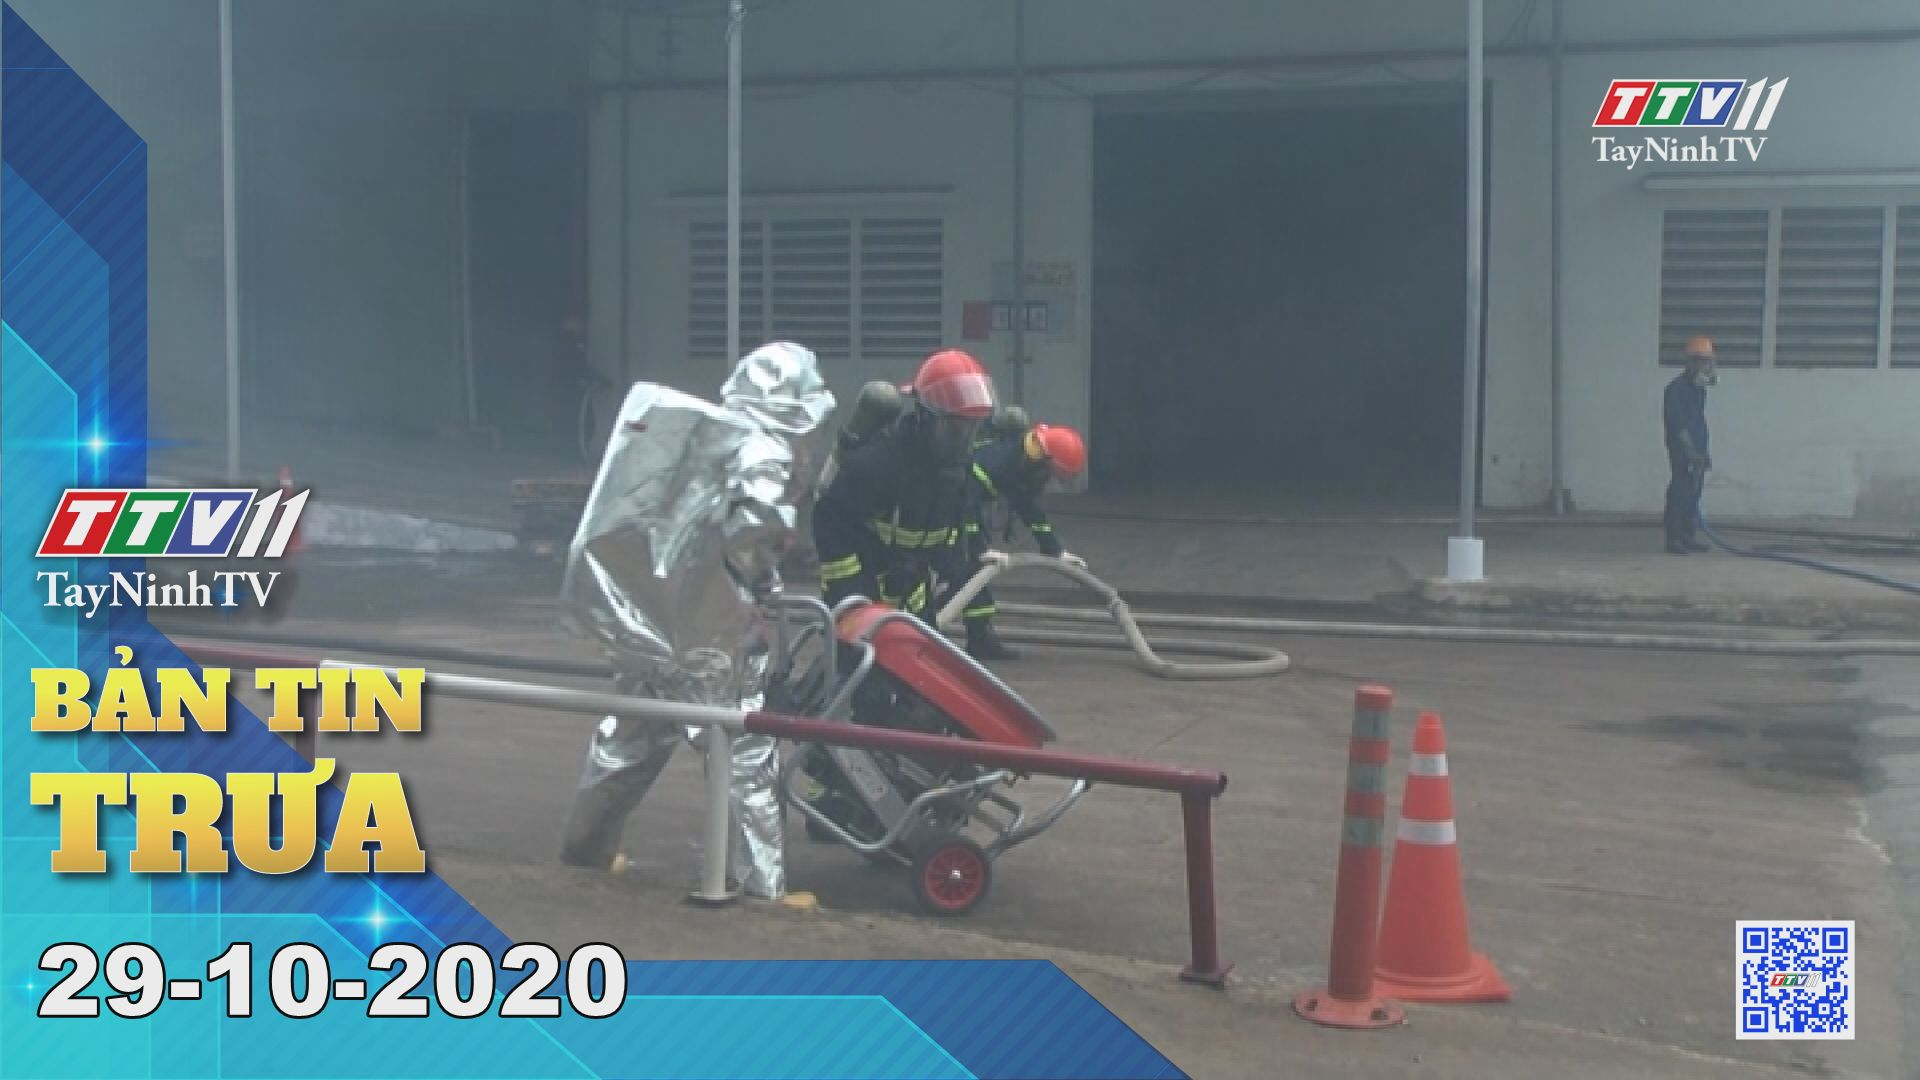 Bản tin trưa 29-10-2020 | Tin tức hôm nay | TayNinhTV